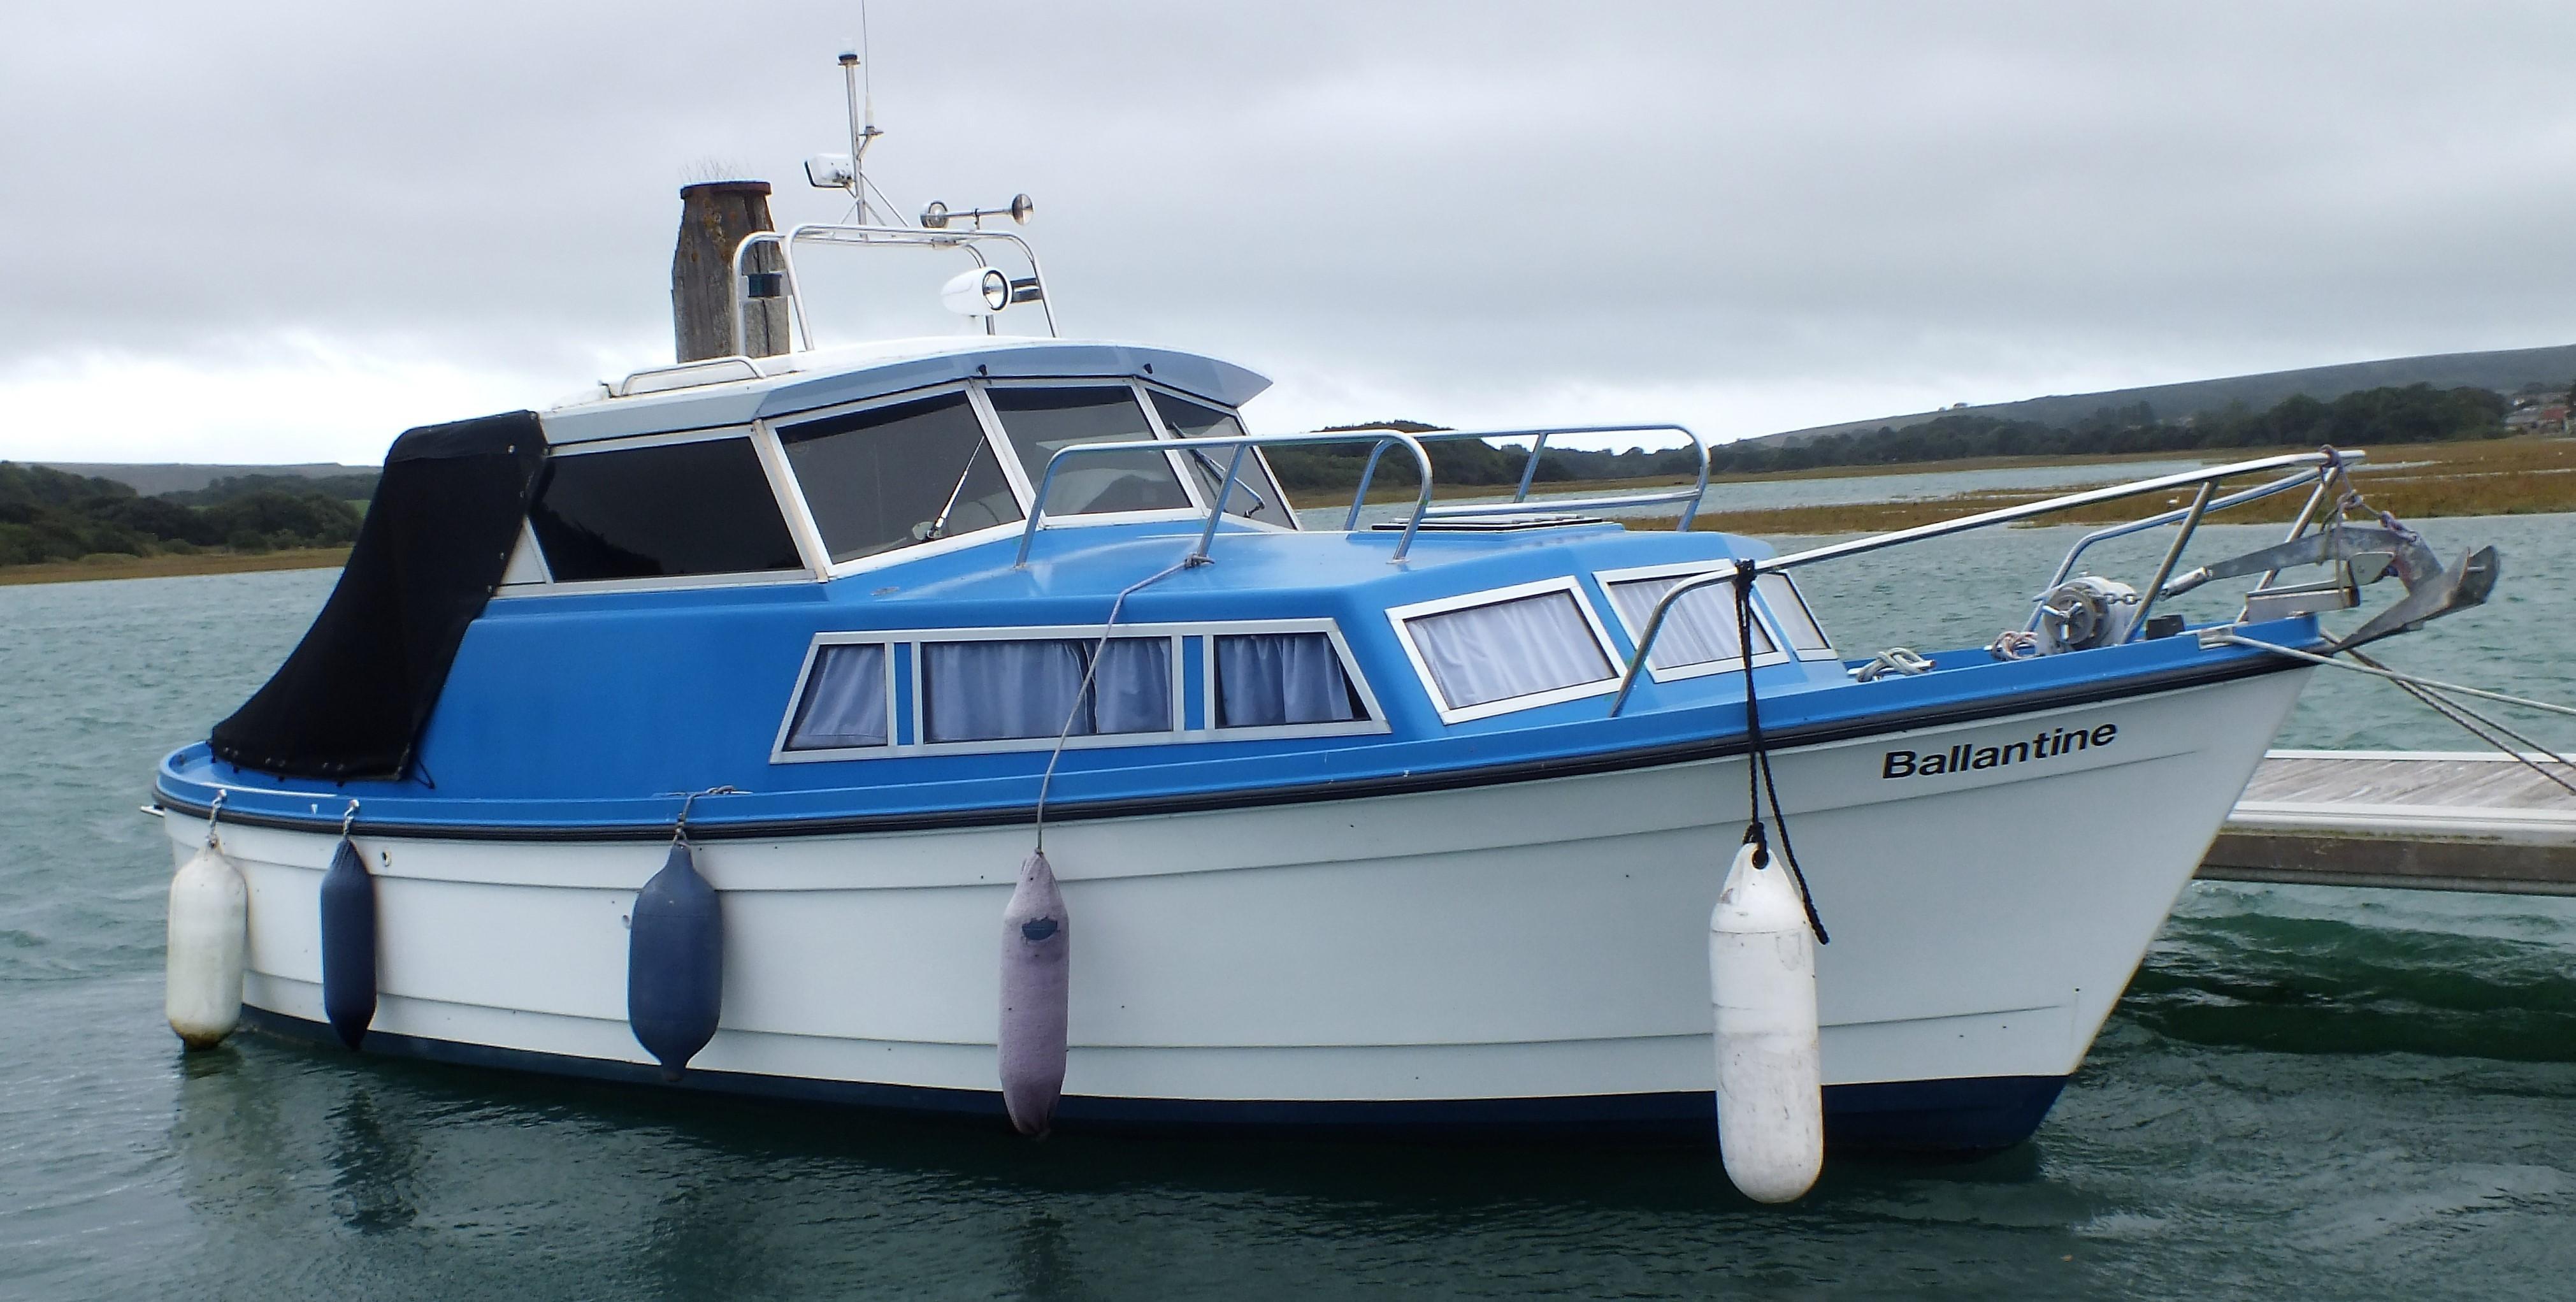 Cutlass Tresfjord 26